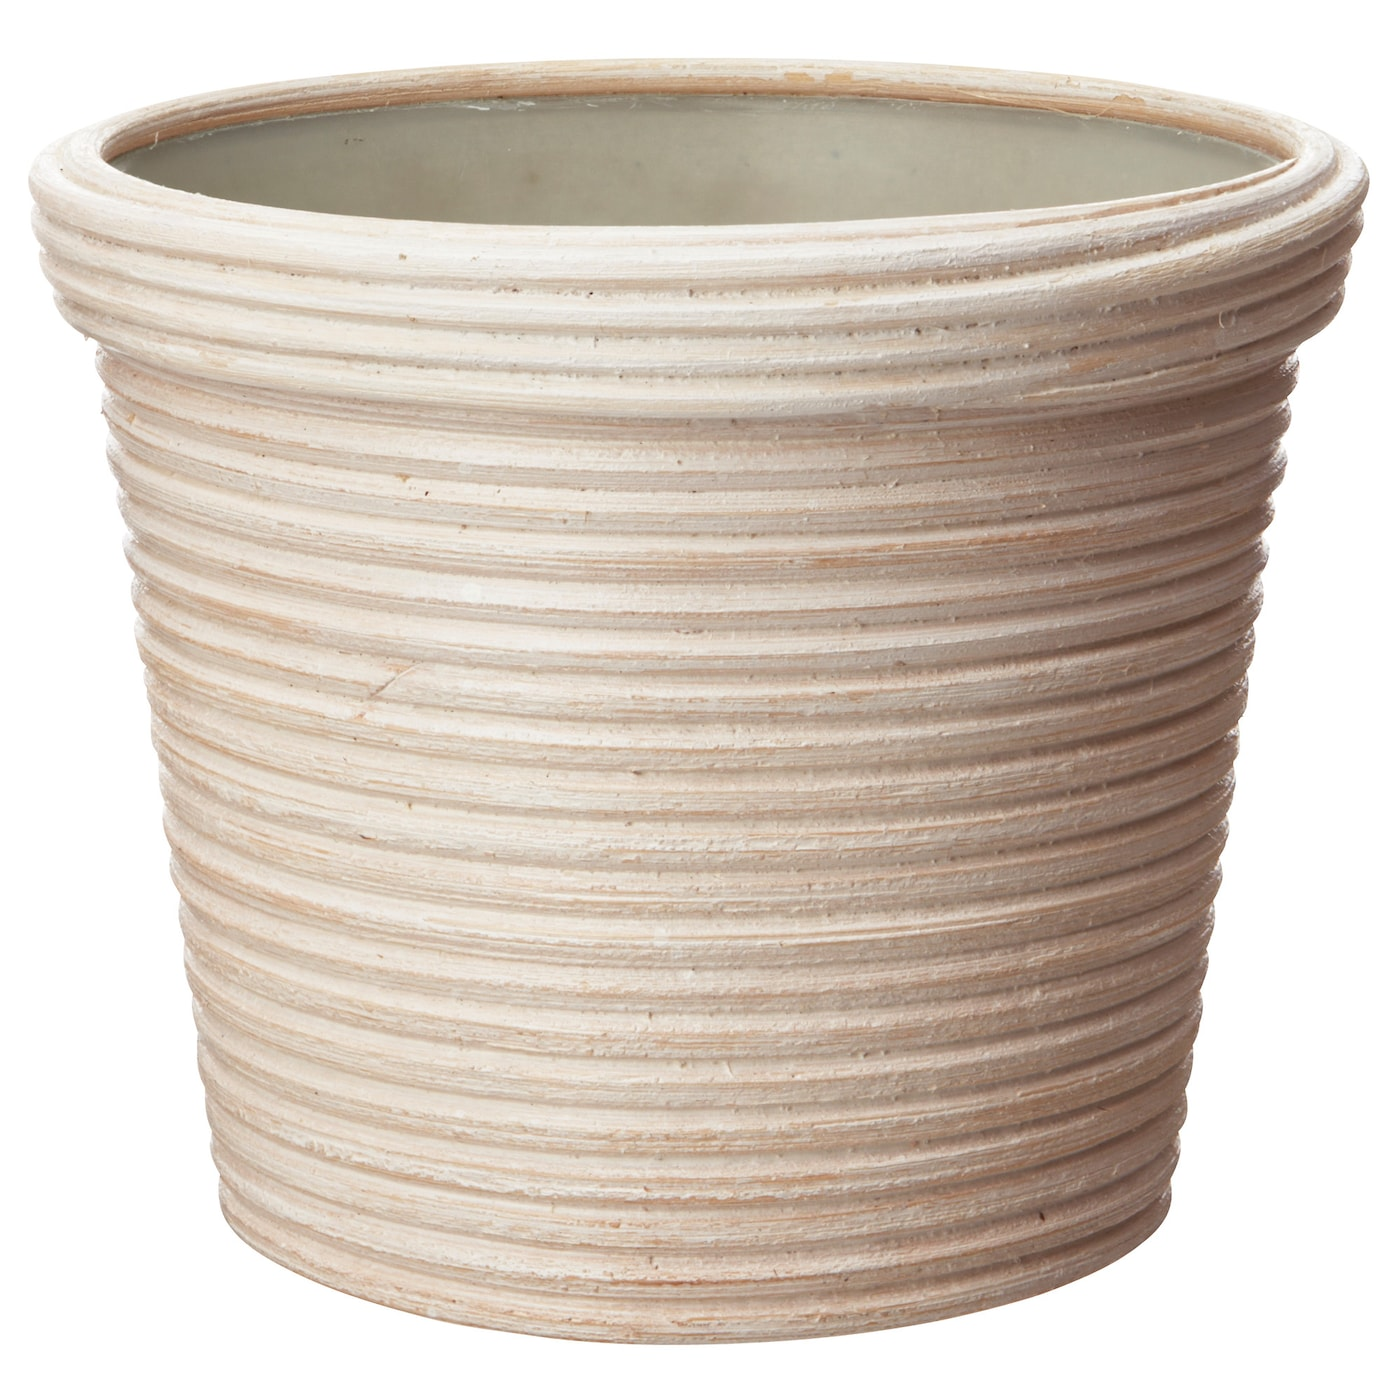 Pekann t plant pot rattan 12 cm ikea for Vasi in rattan